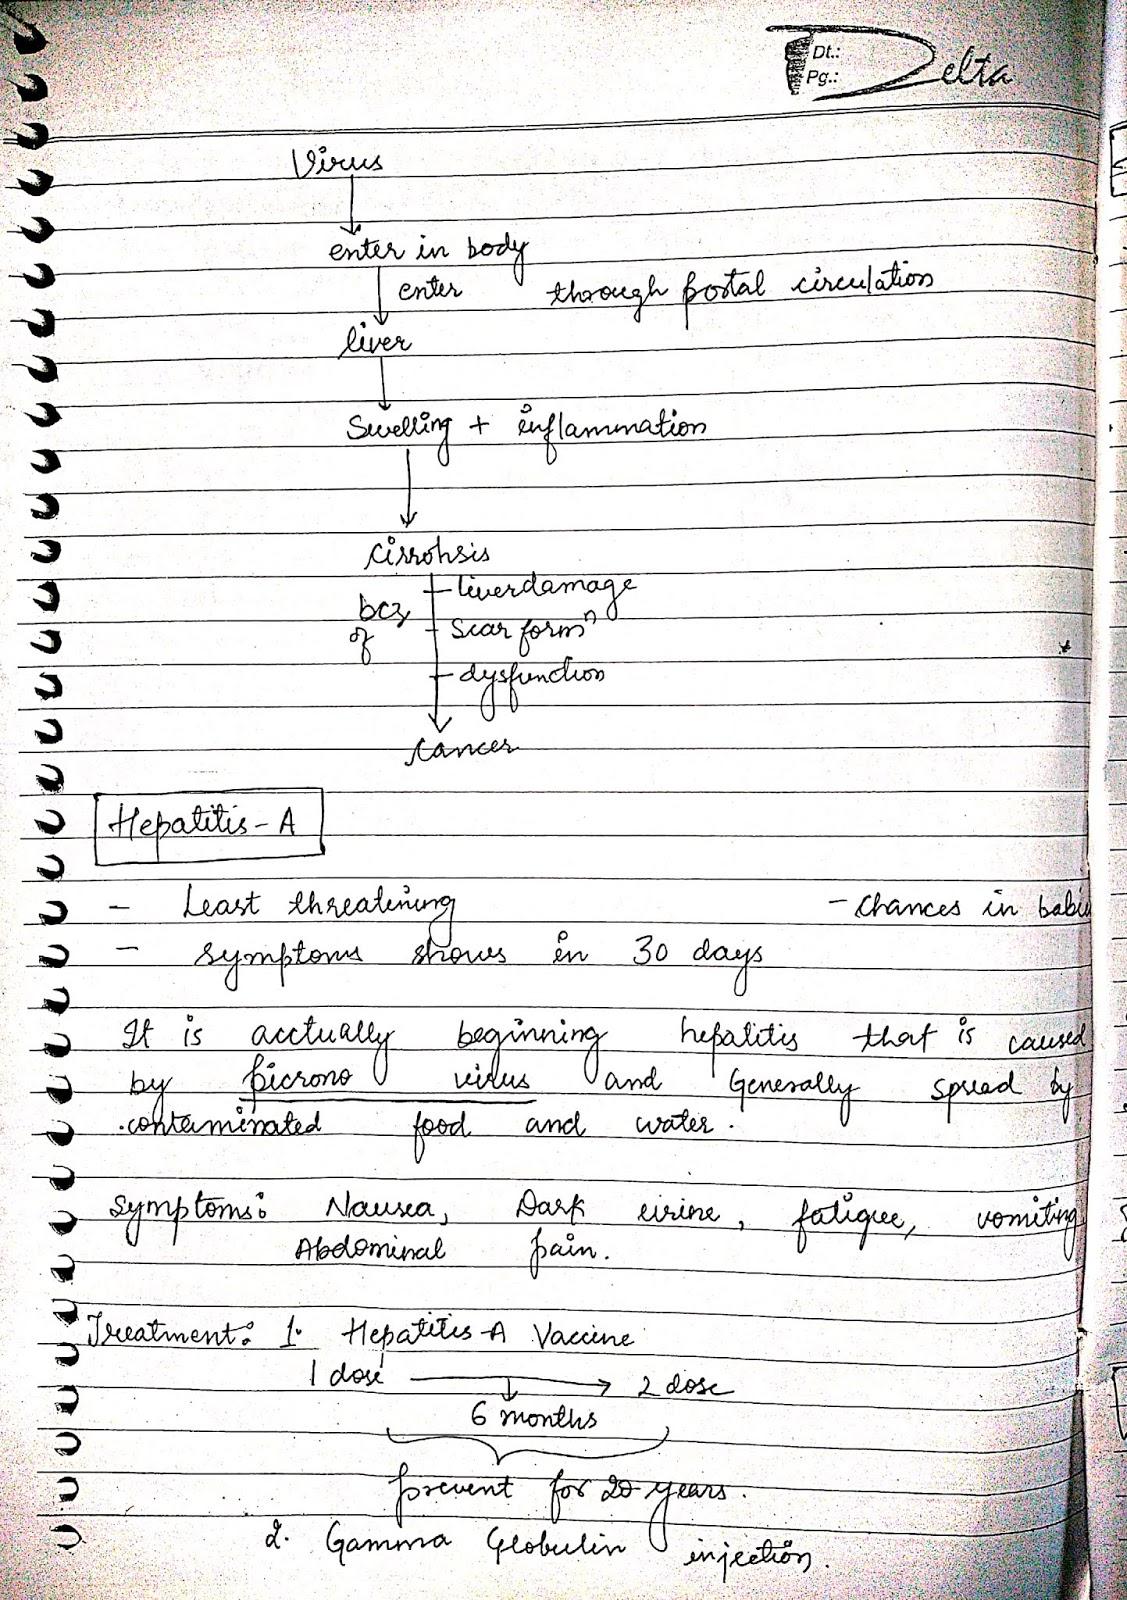 pathophysiology - hepatitis